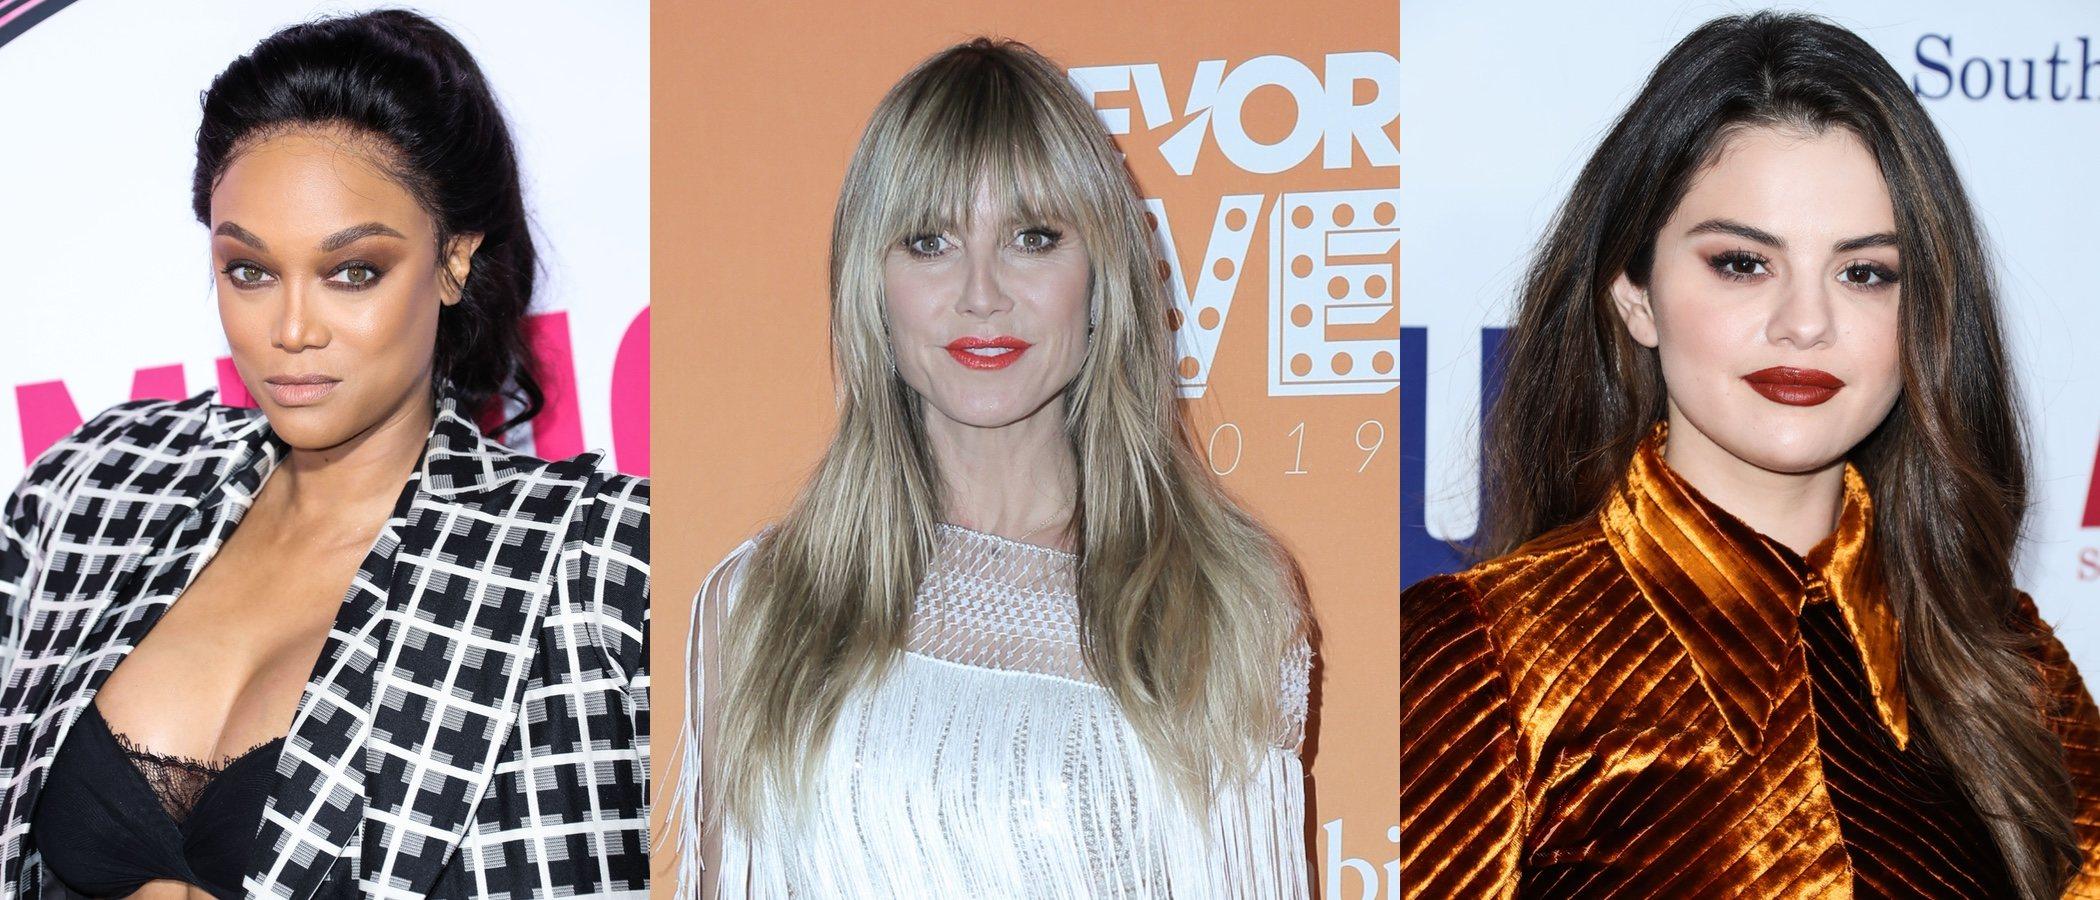 Heidi Klum, Selena Gomez y Tyra Banks lucen los peores beauty looks de la semana